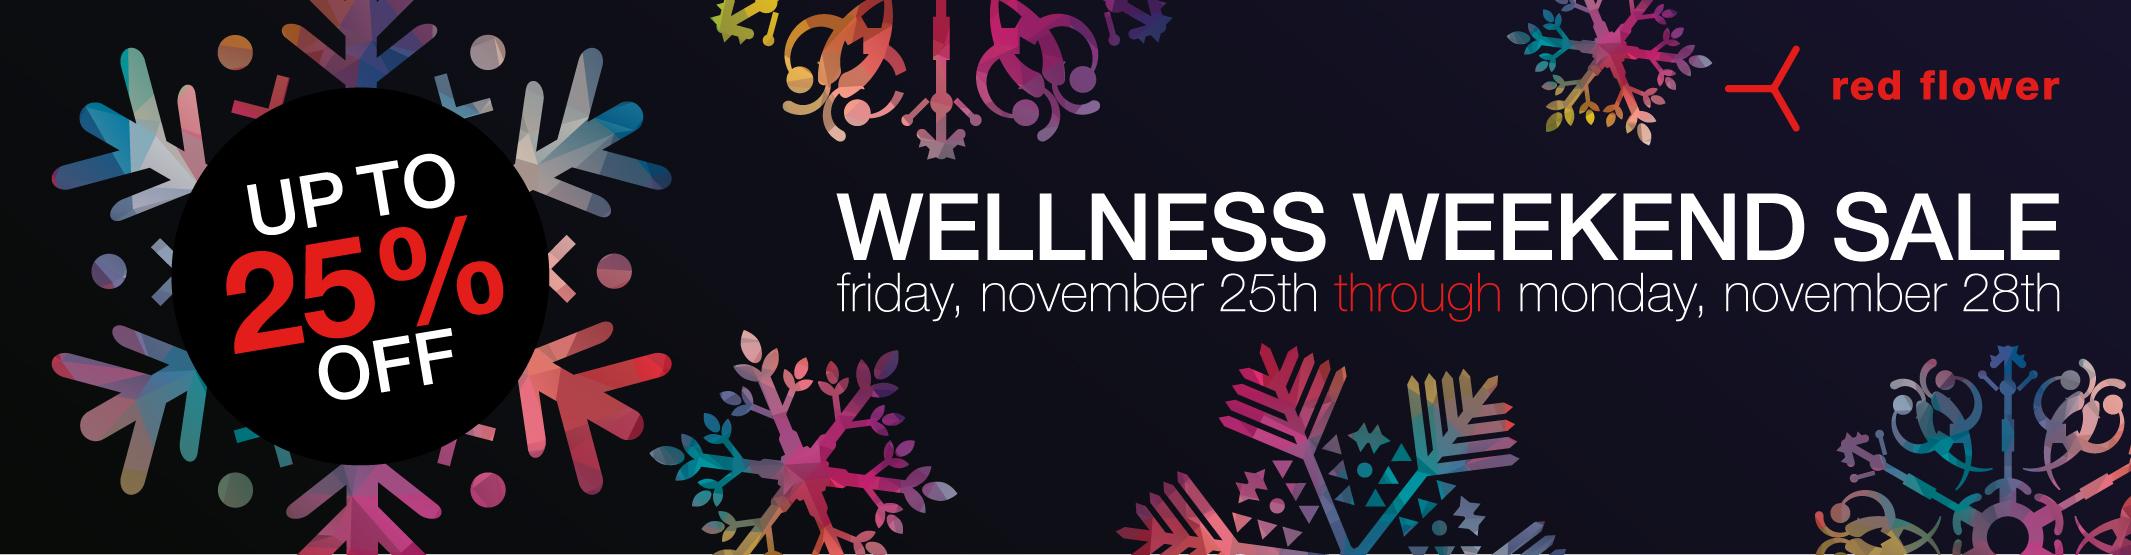 cyber monday weekend wellness items